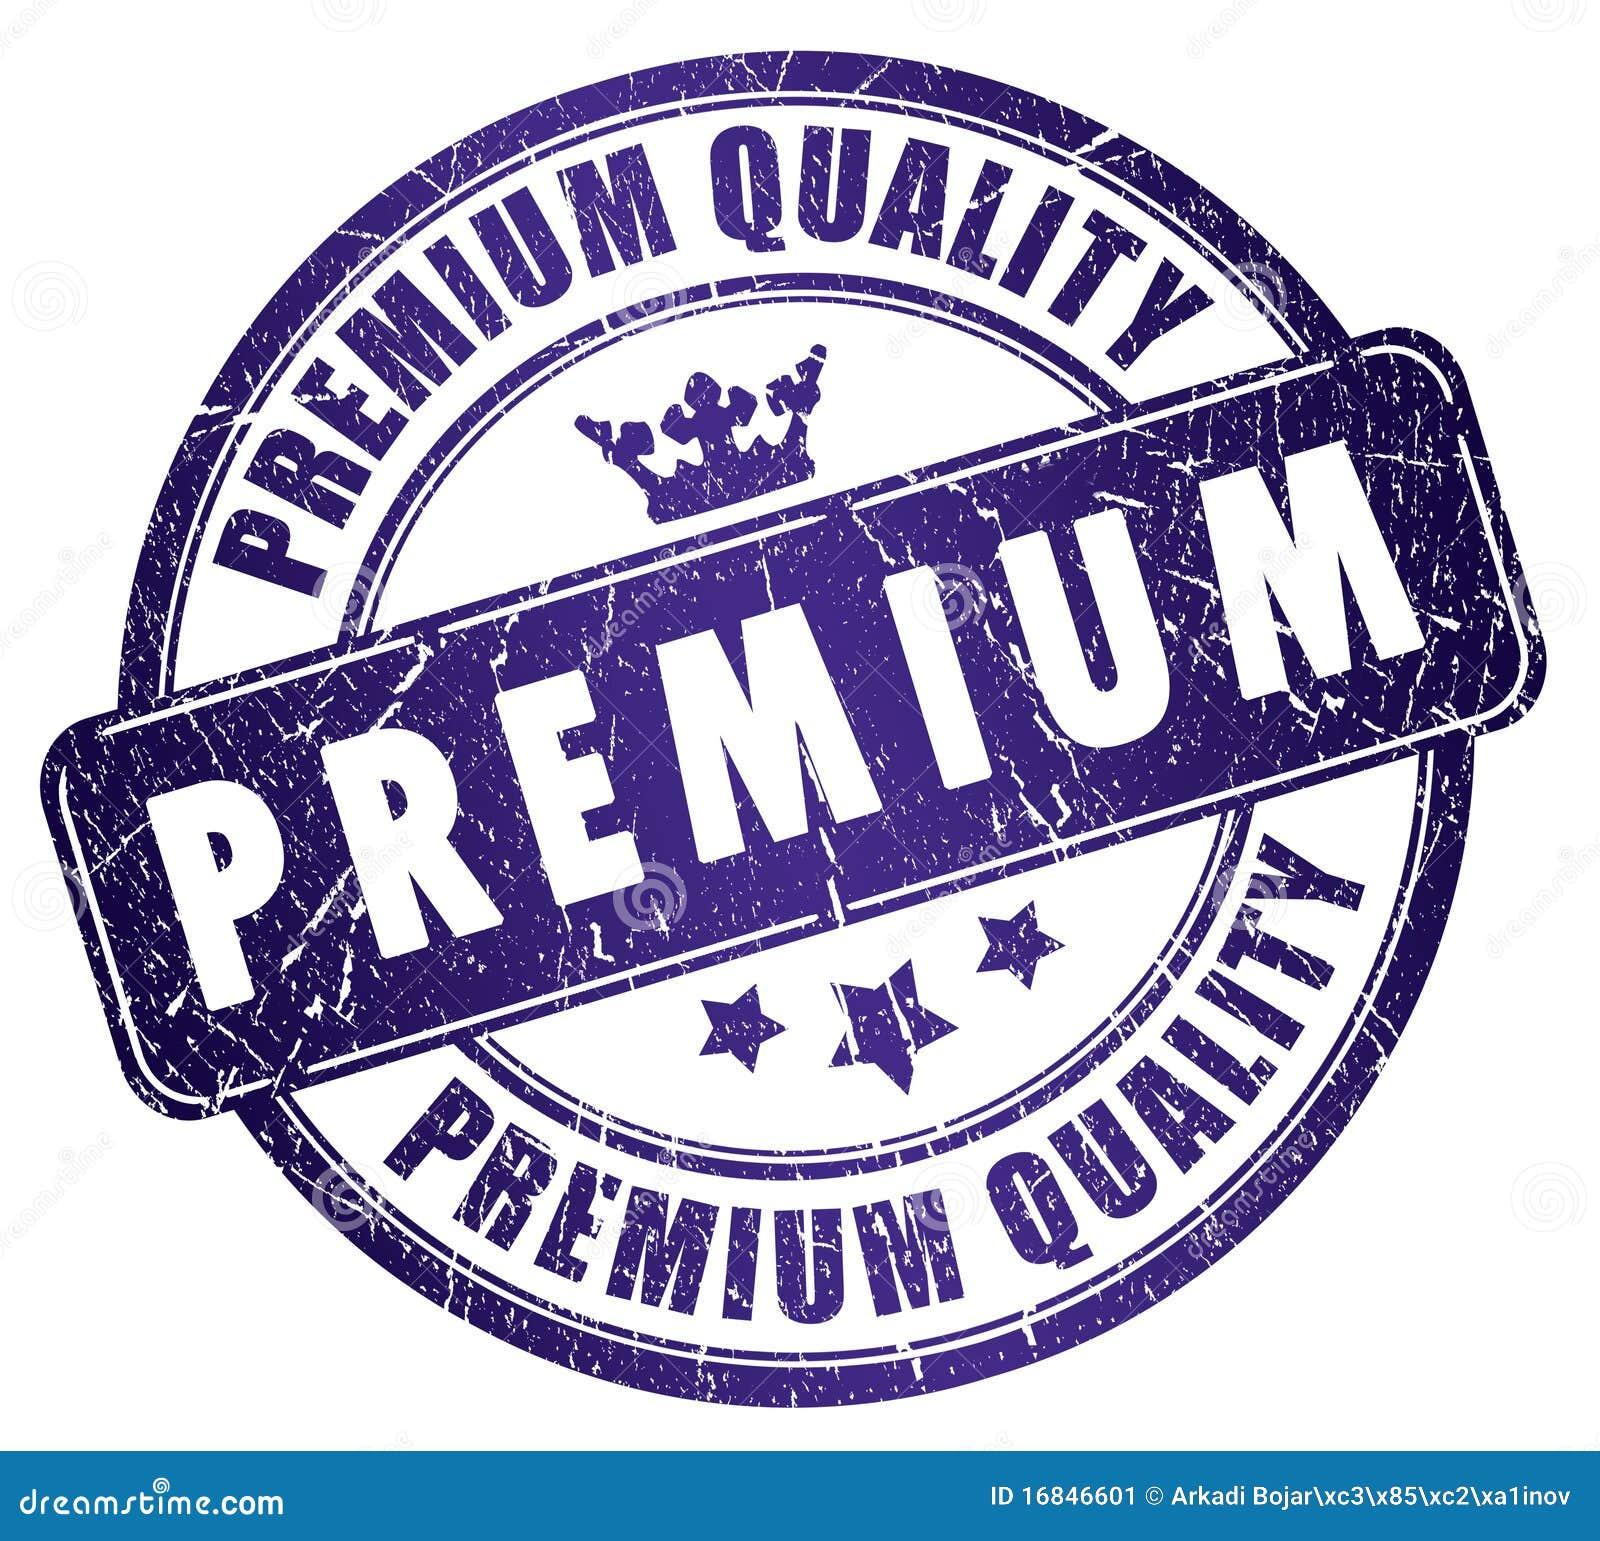 Premium Quality Stamp Stock Image - Image: 16846601